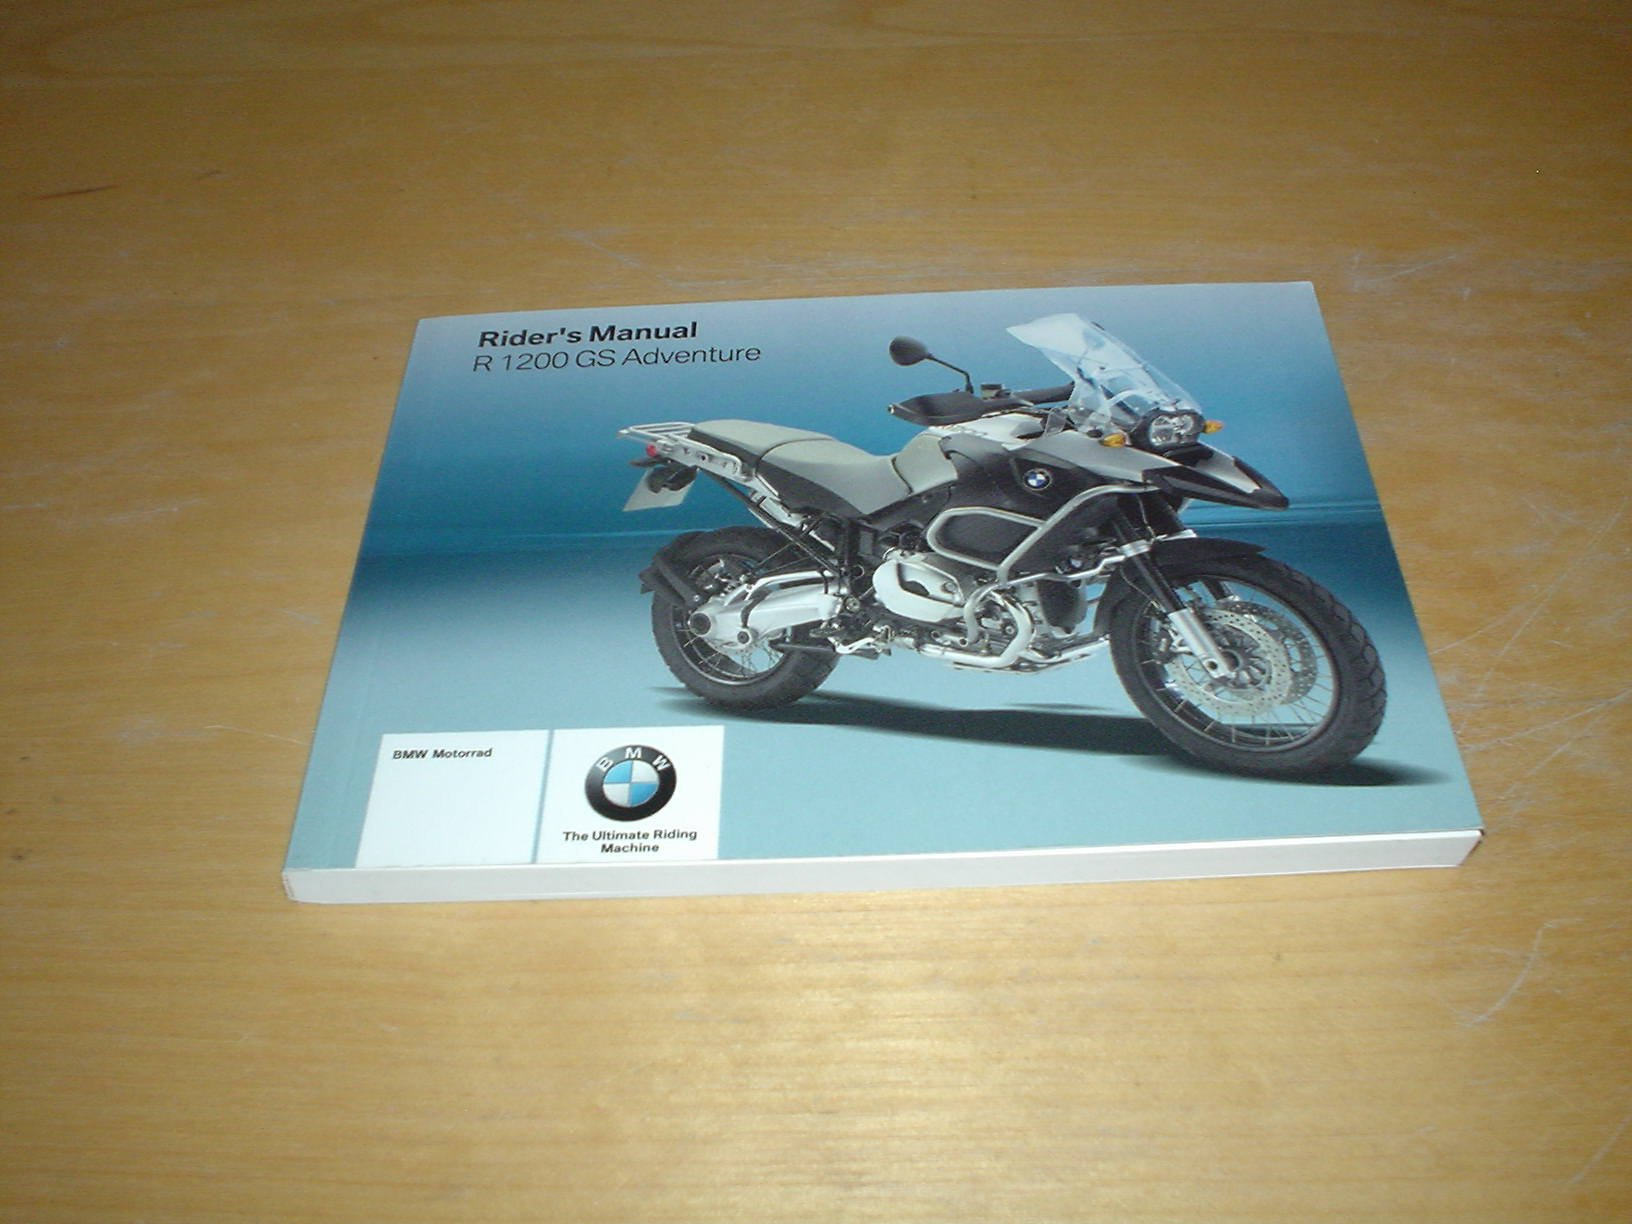 BMW R1200 GS ADVENTURE R1200GS MOTORCYCLE OWNERS HANDBOOK MANUAL R 1200 GS  GSA R1200GSA: Amazon.co.uk: BMW: Books